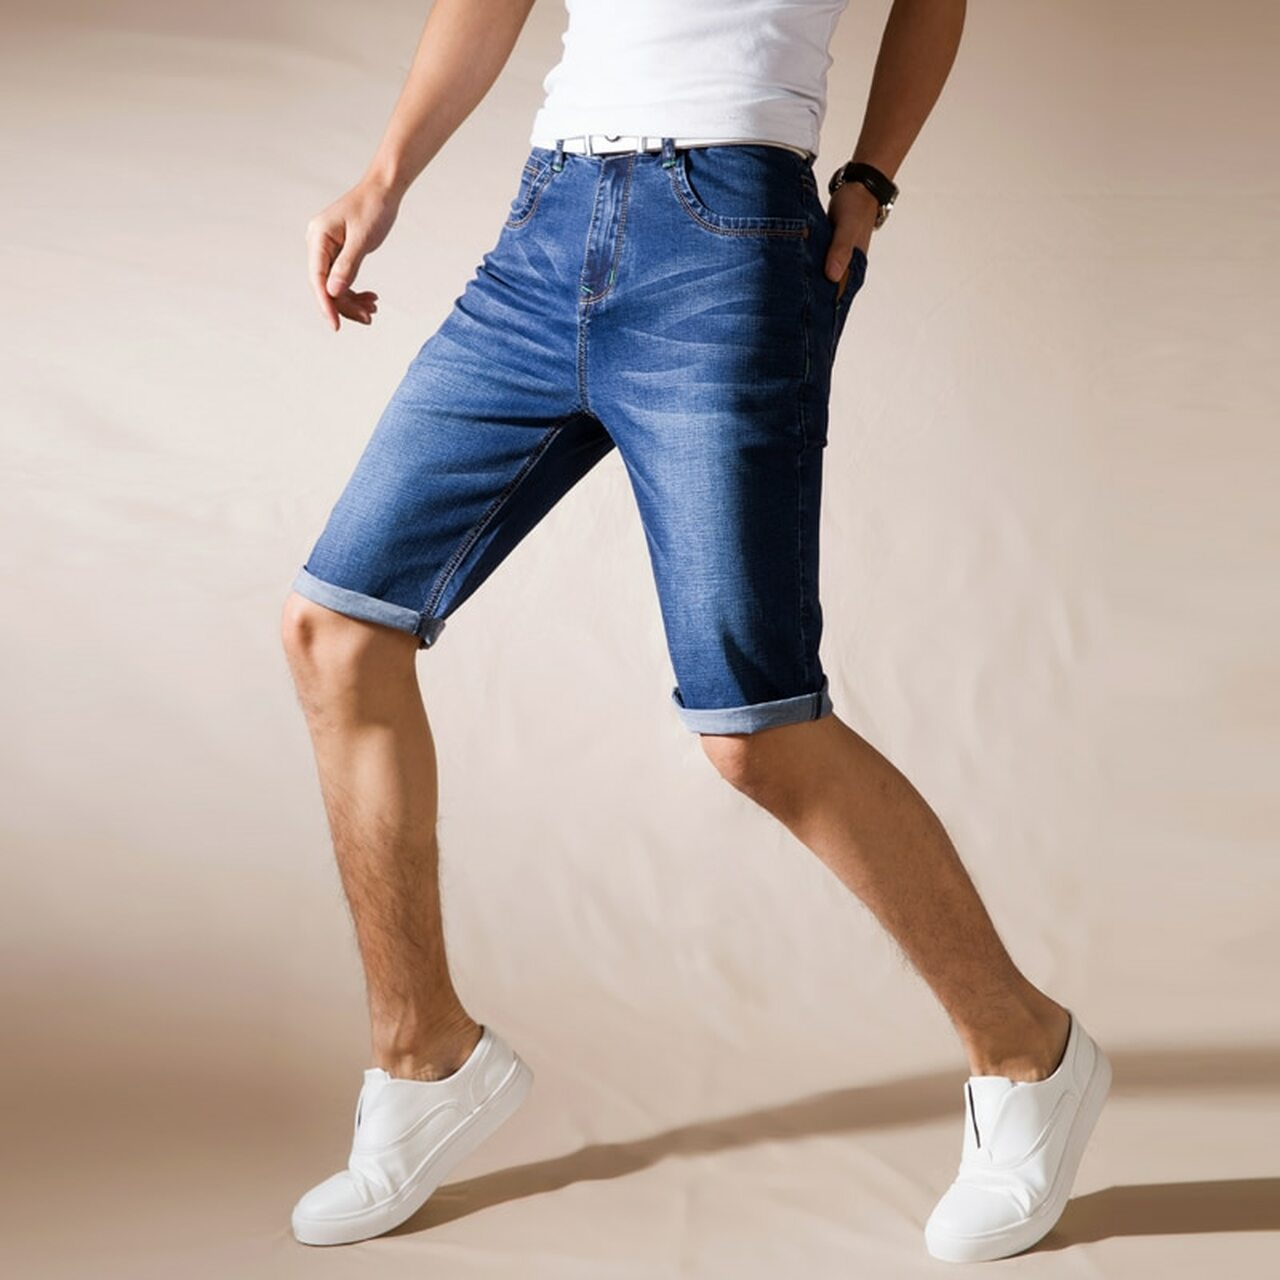 d00f0e3ea1af ... jantour Brand Mens Summer Stretch Thin high quality Denim Jeans male  Short Men blue black Jeans ...